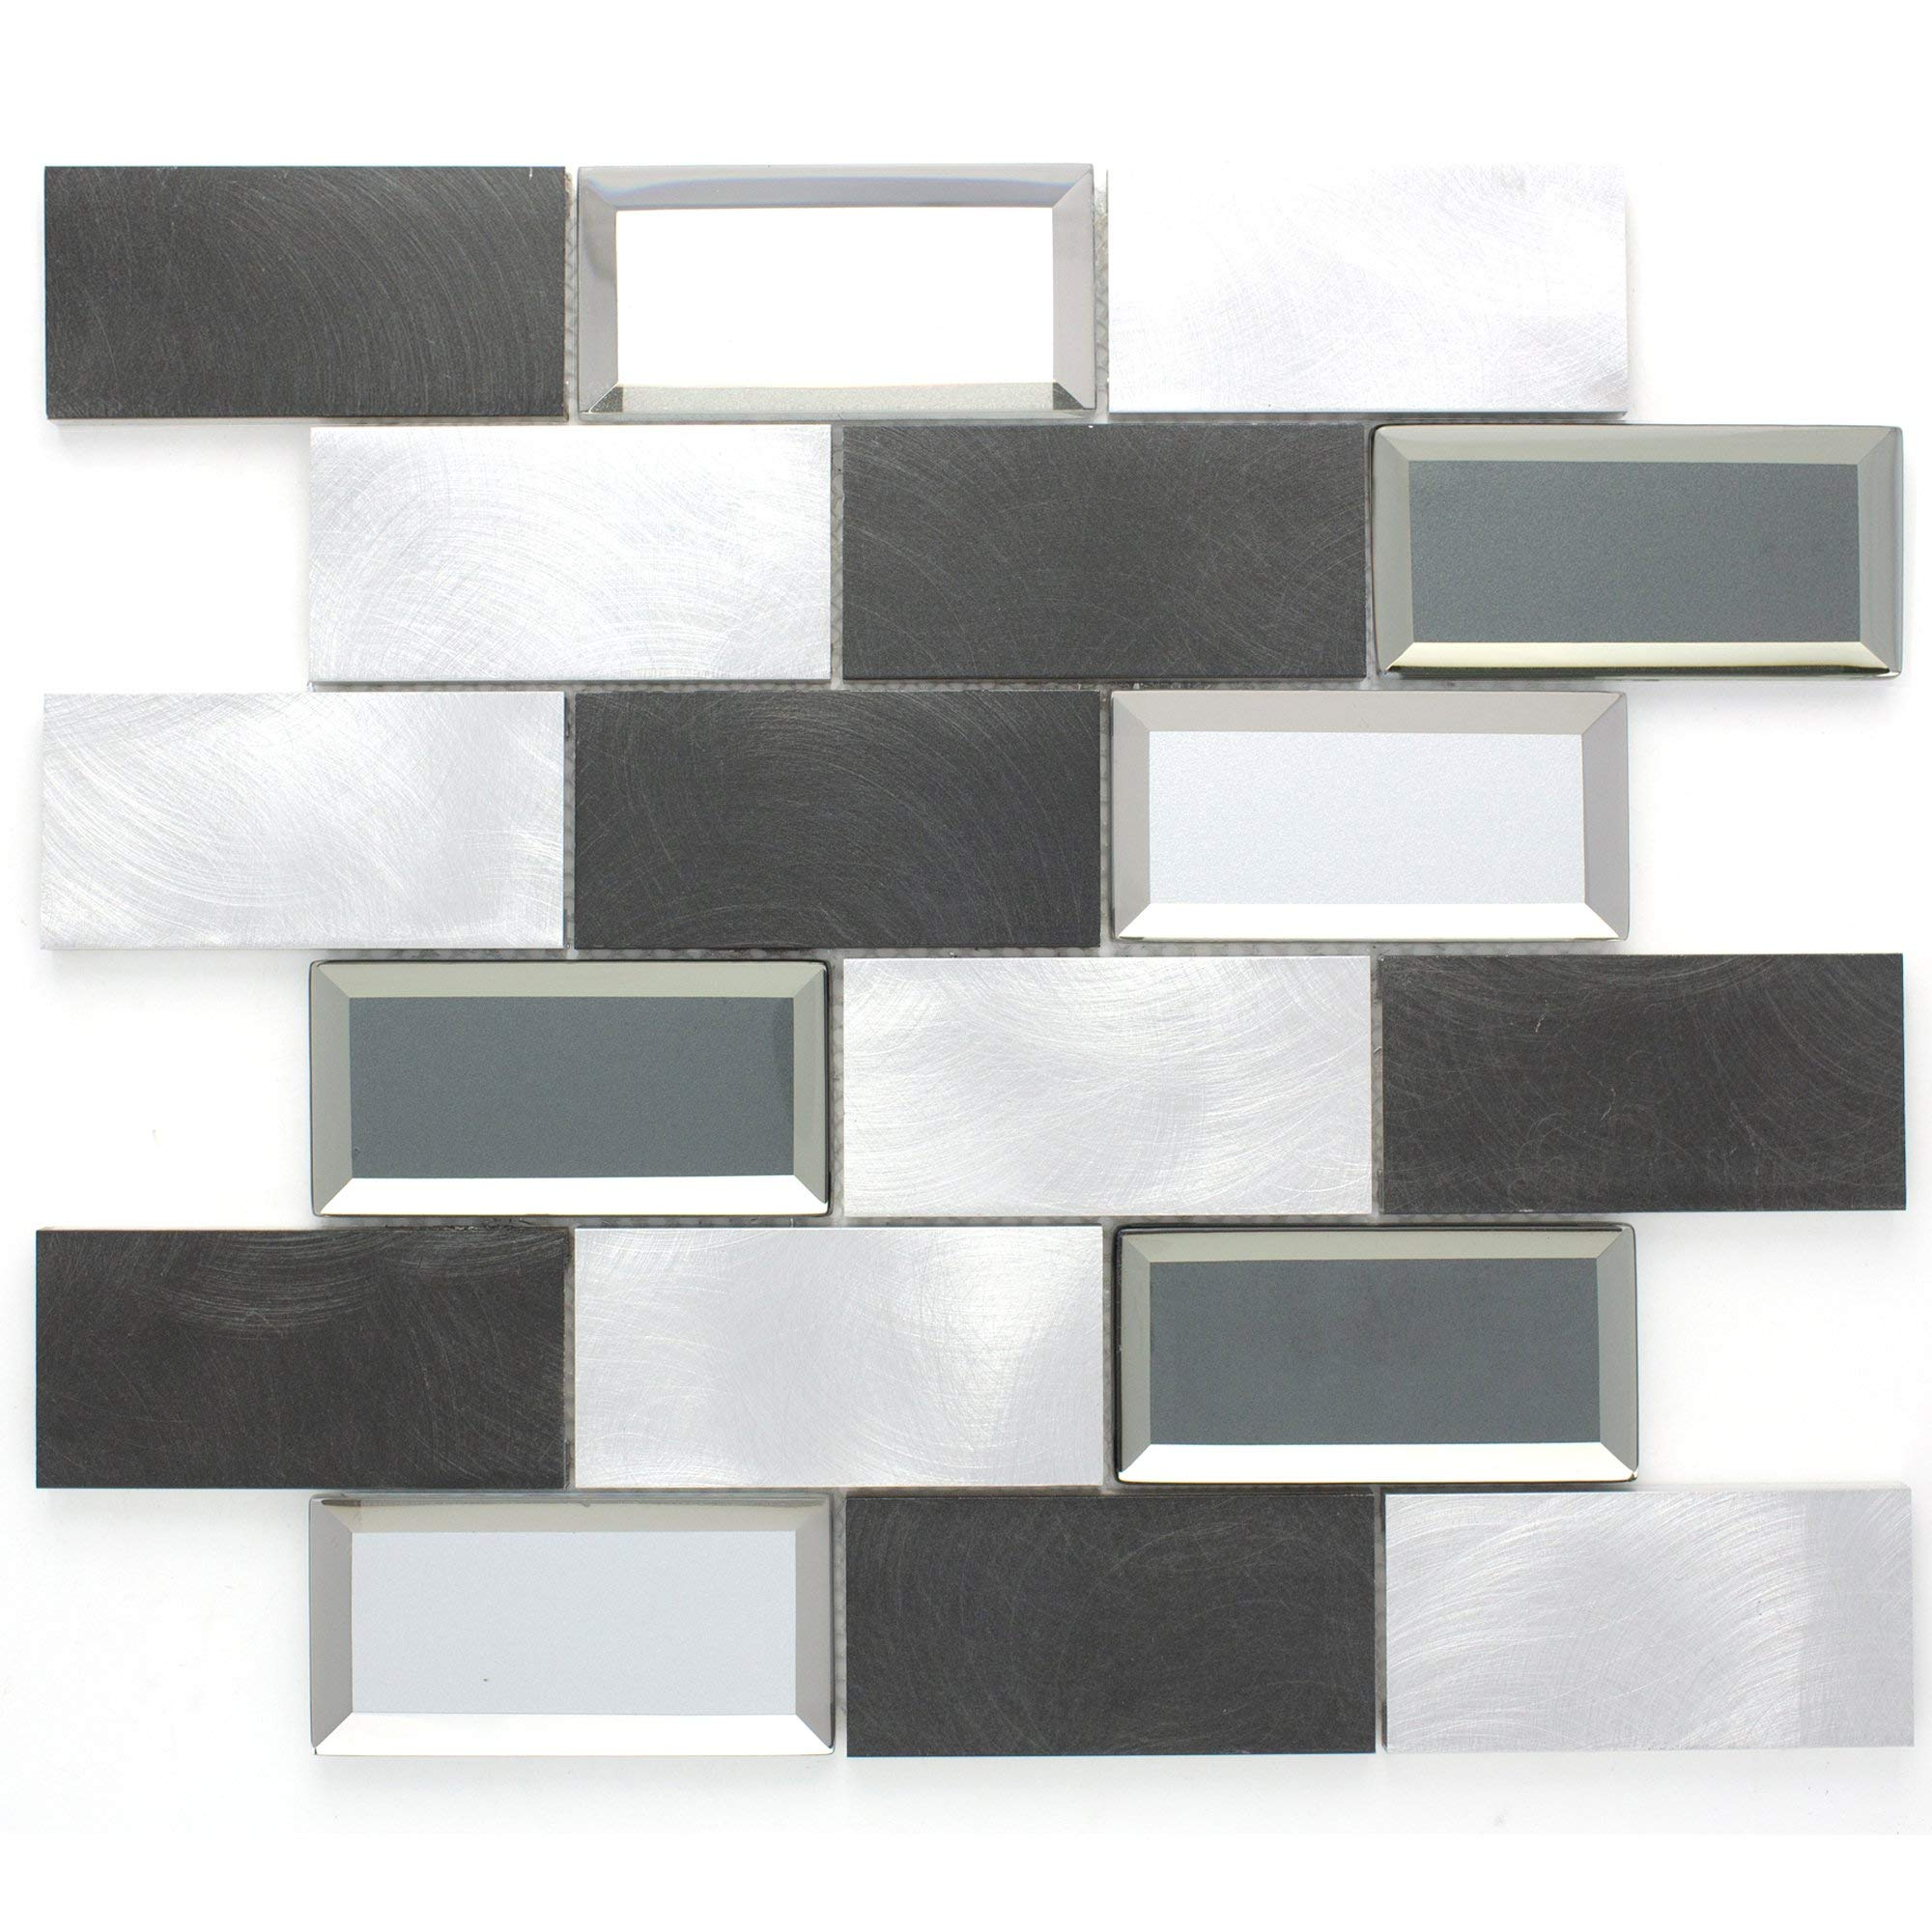 TAFMG-02 2x4 Subway Tile Grey Almiunum Mix Mirror Glass Mosaic Tile-Kitchen and Bath backsplash Wall Tile